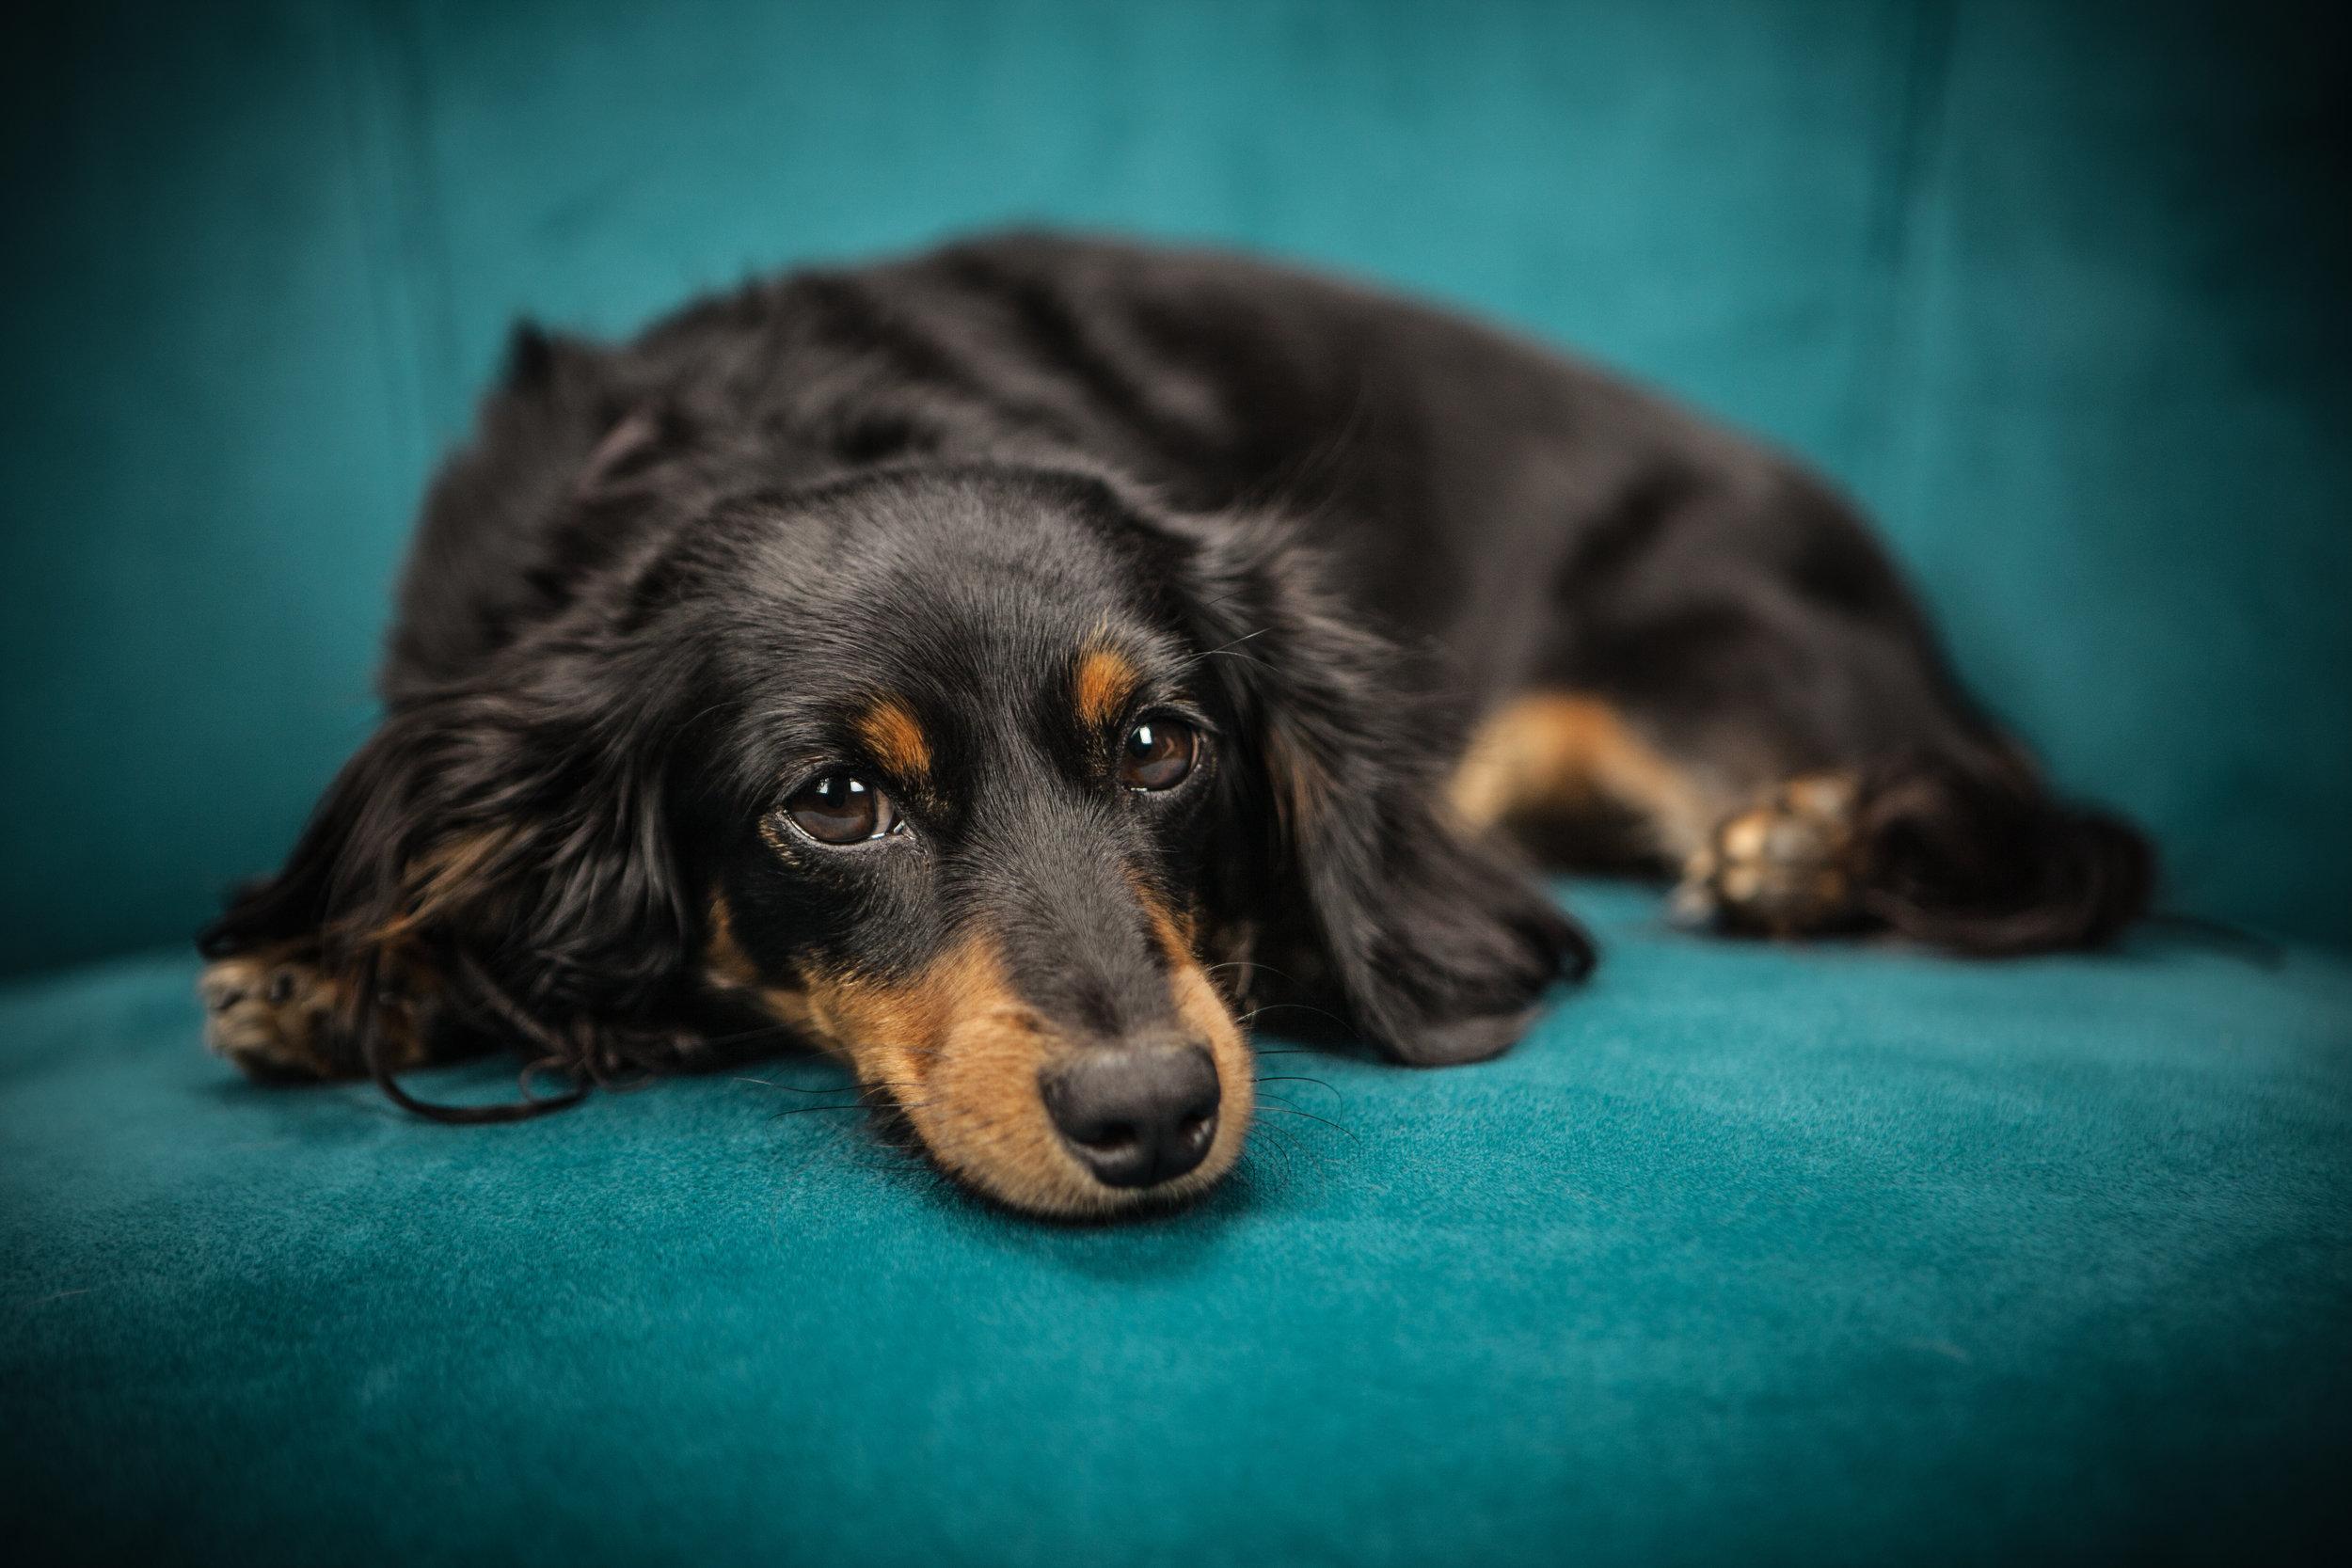 Depressed Dog APL